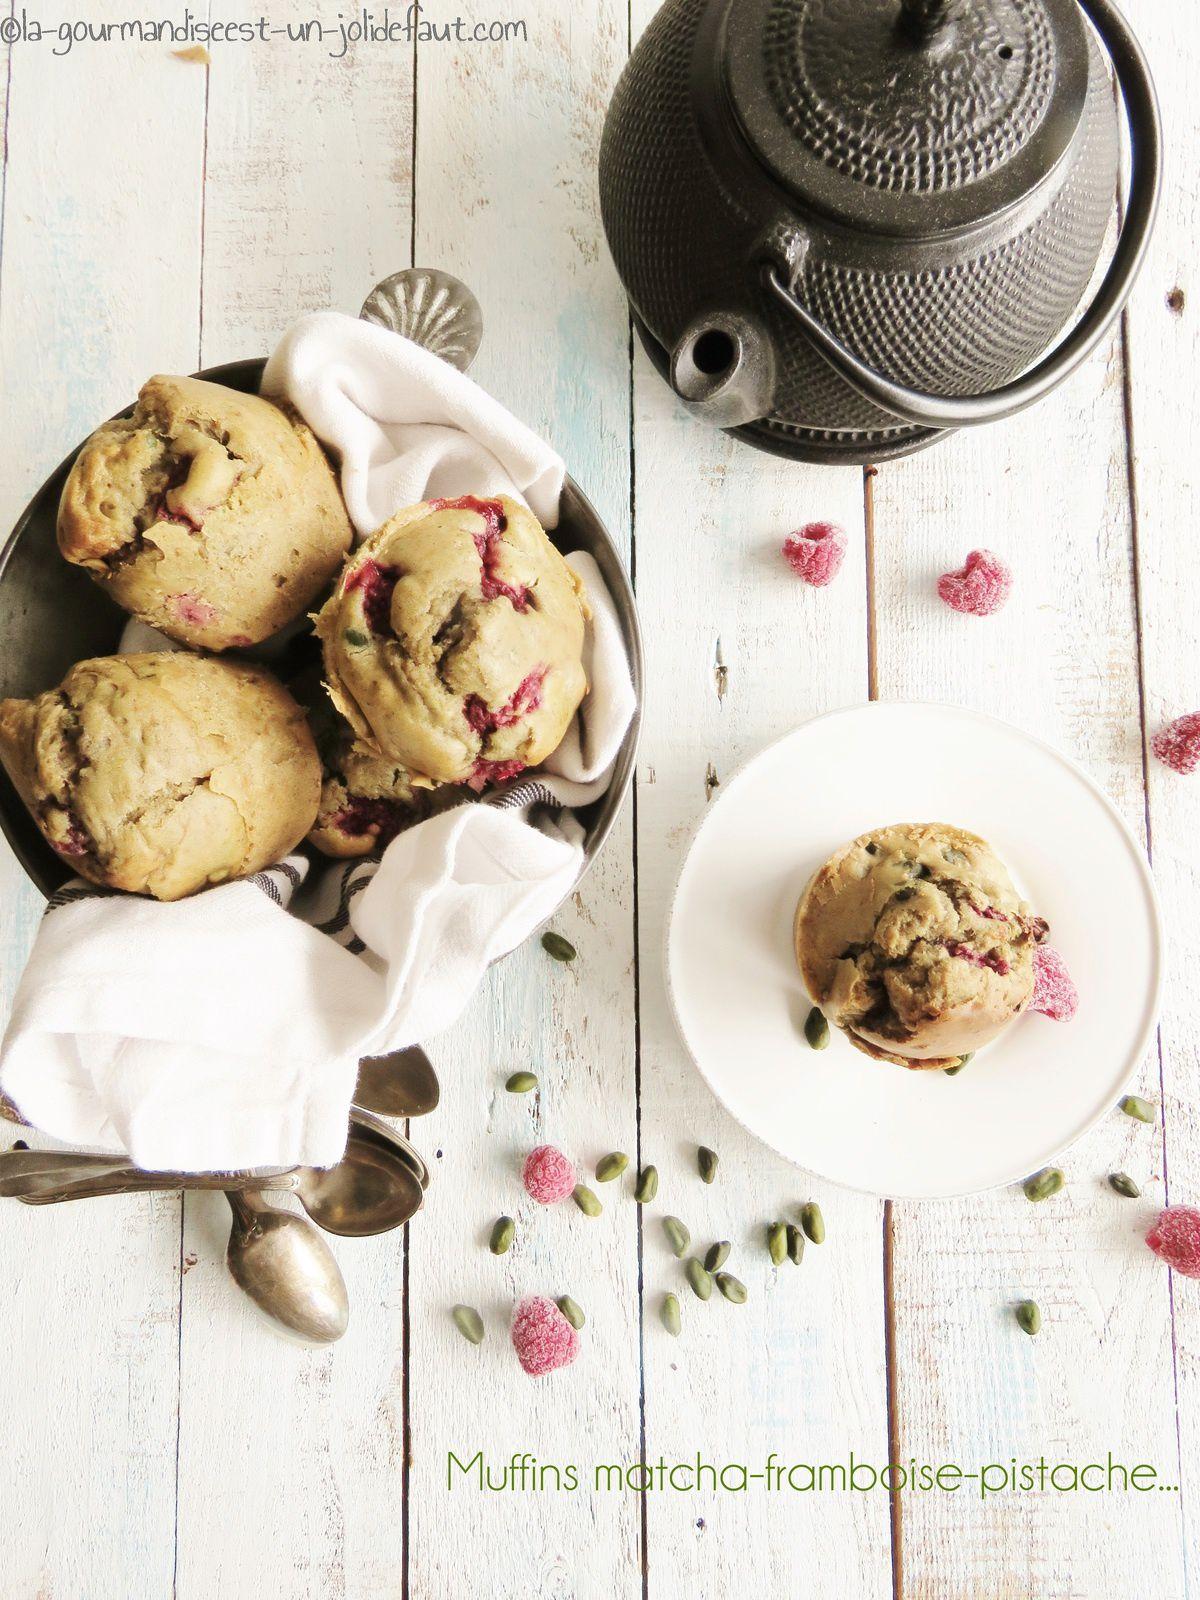 Muffins matcha framboise et pistache